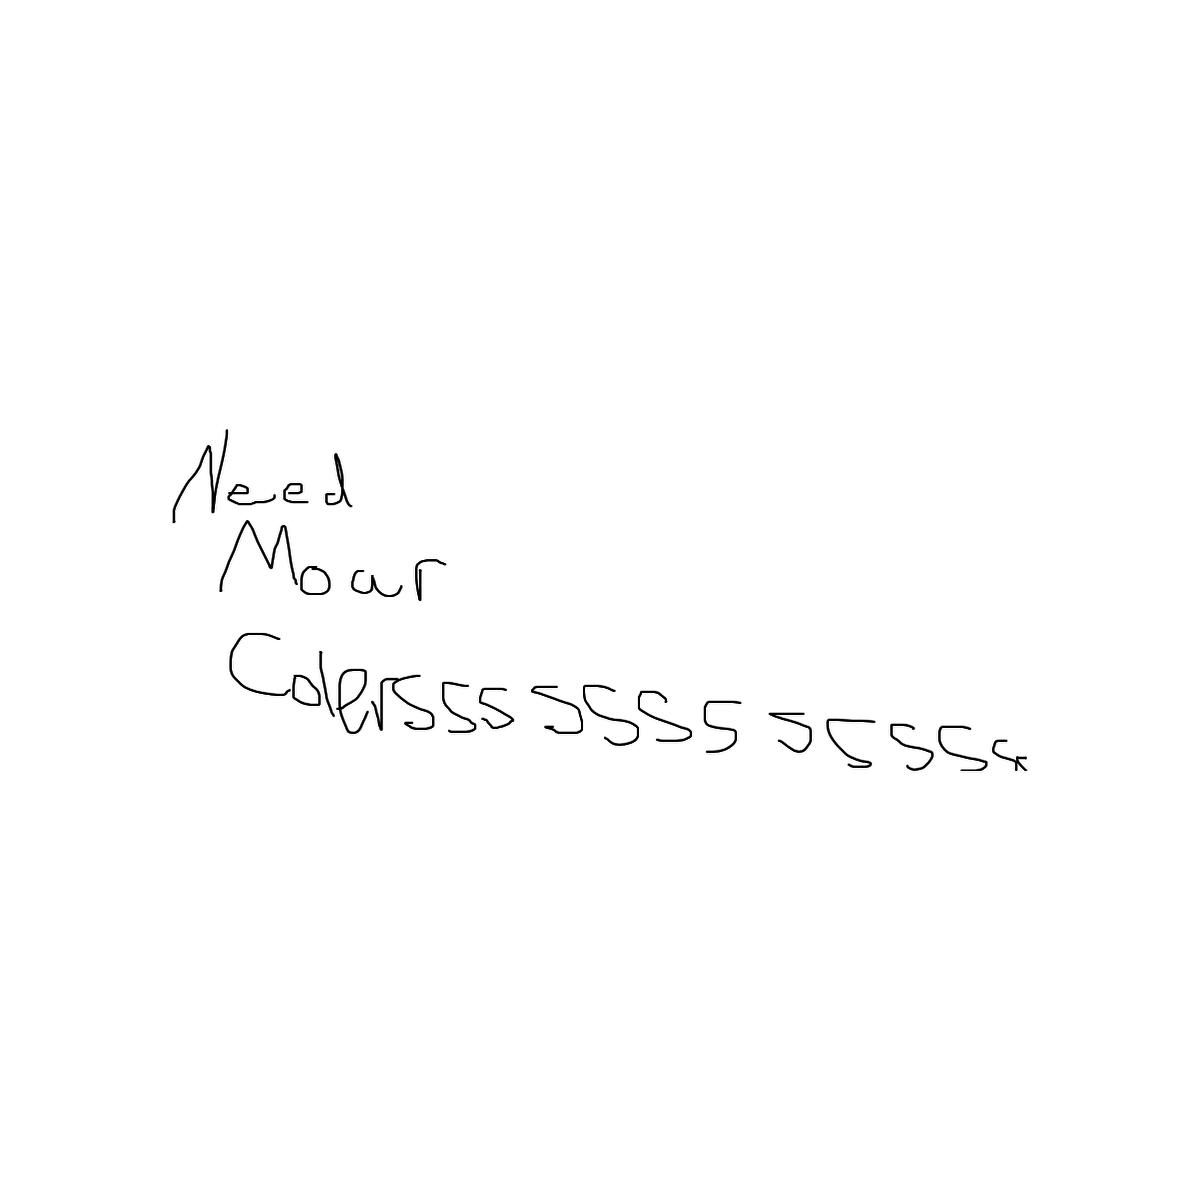 BAAAM drawing#1150 lat:-17.6270103454589840lng: -149.4030761718750000